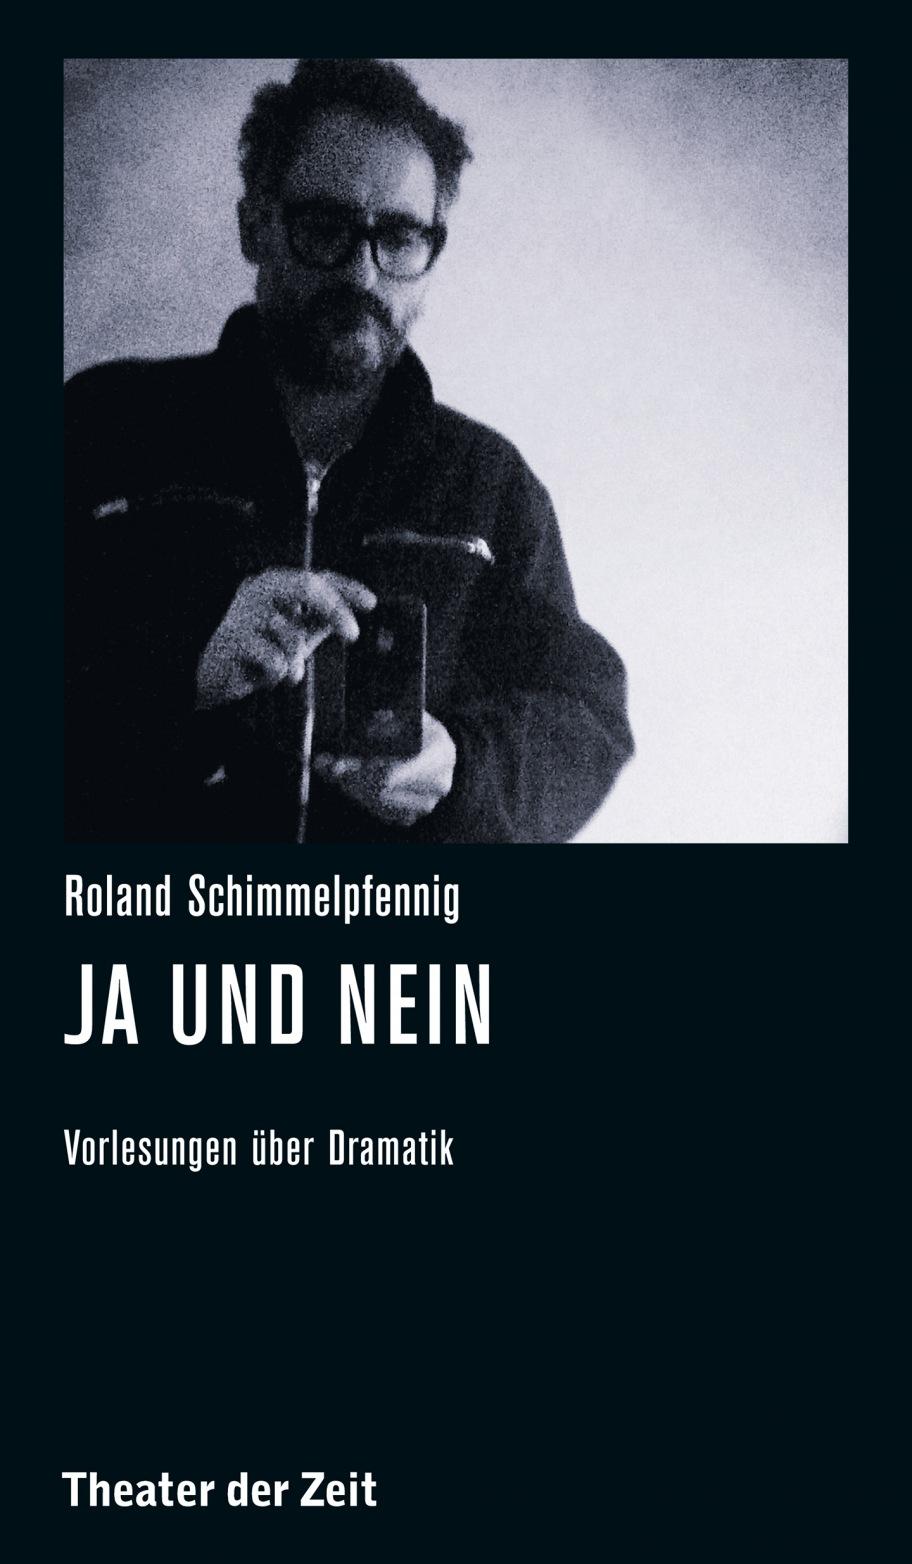 Roland Schimmelpfennig: Roland Schimmelpfennig – Ja und Nein/Sí y No